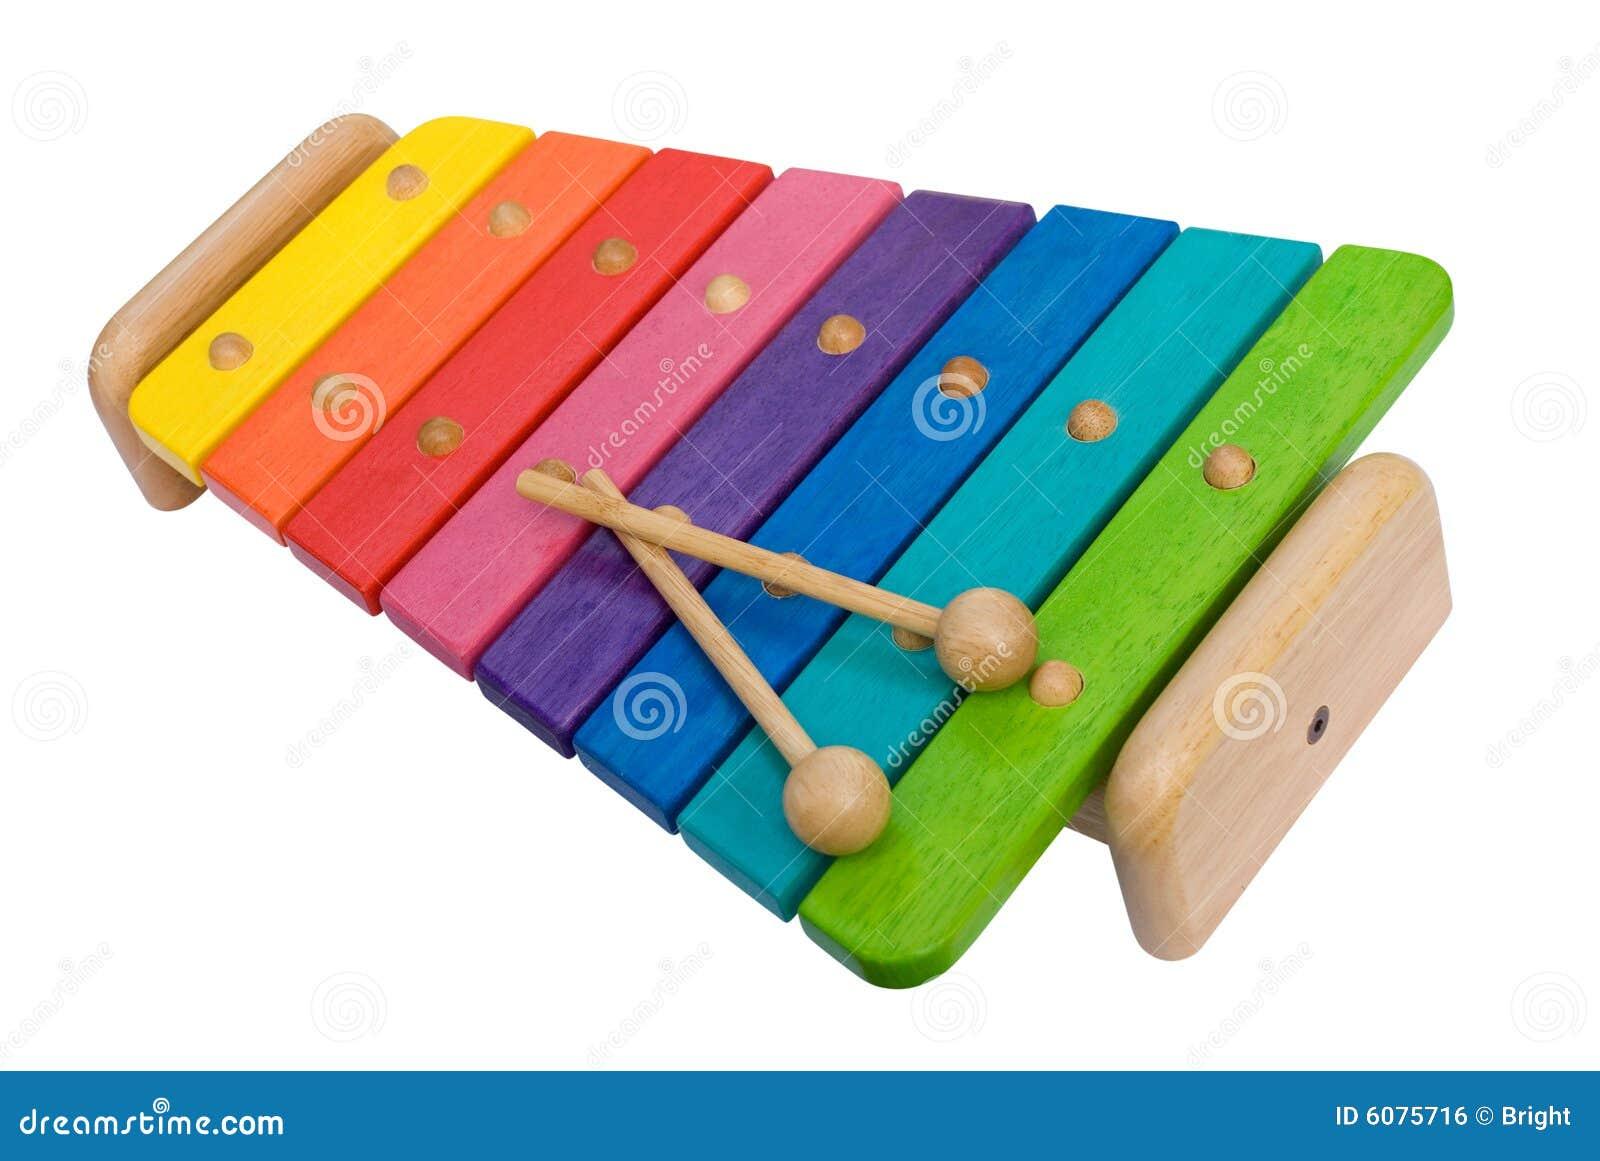 Xylophone Royalty Free Stock Image - Image: 6075716